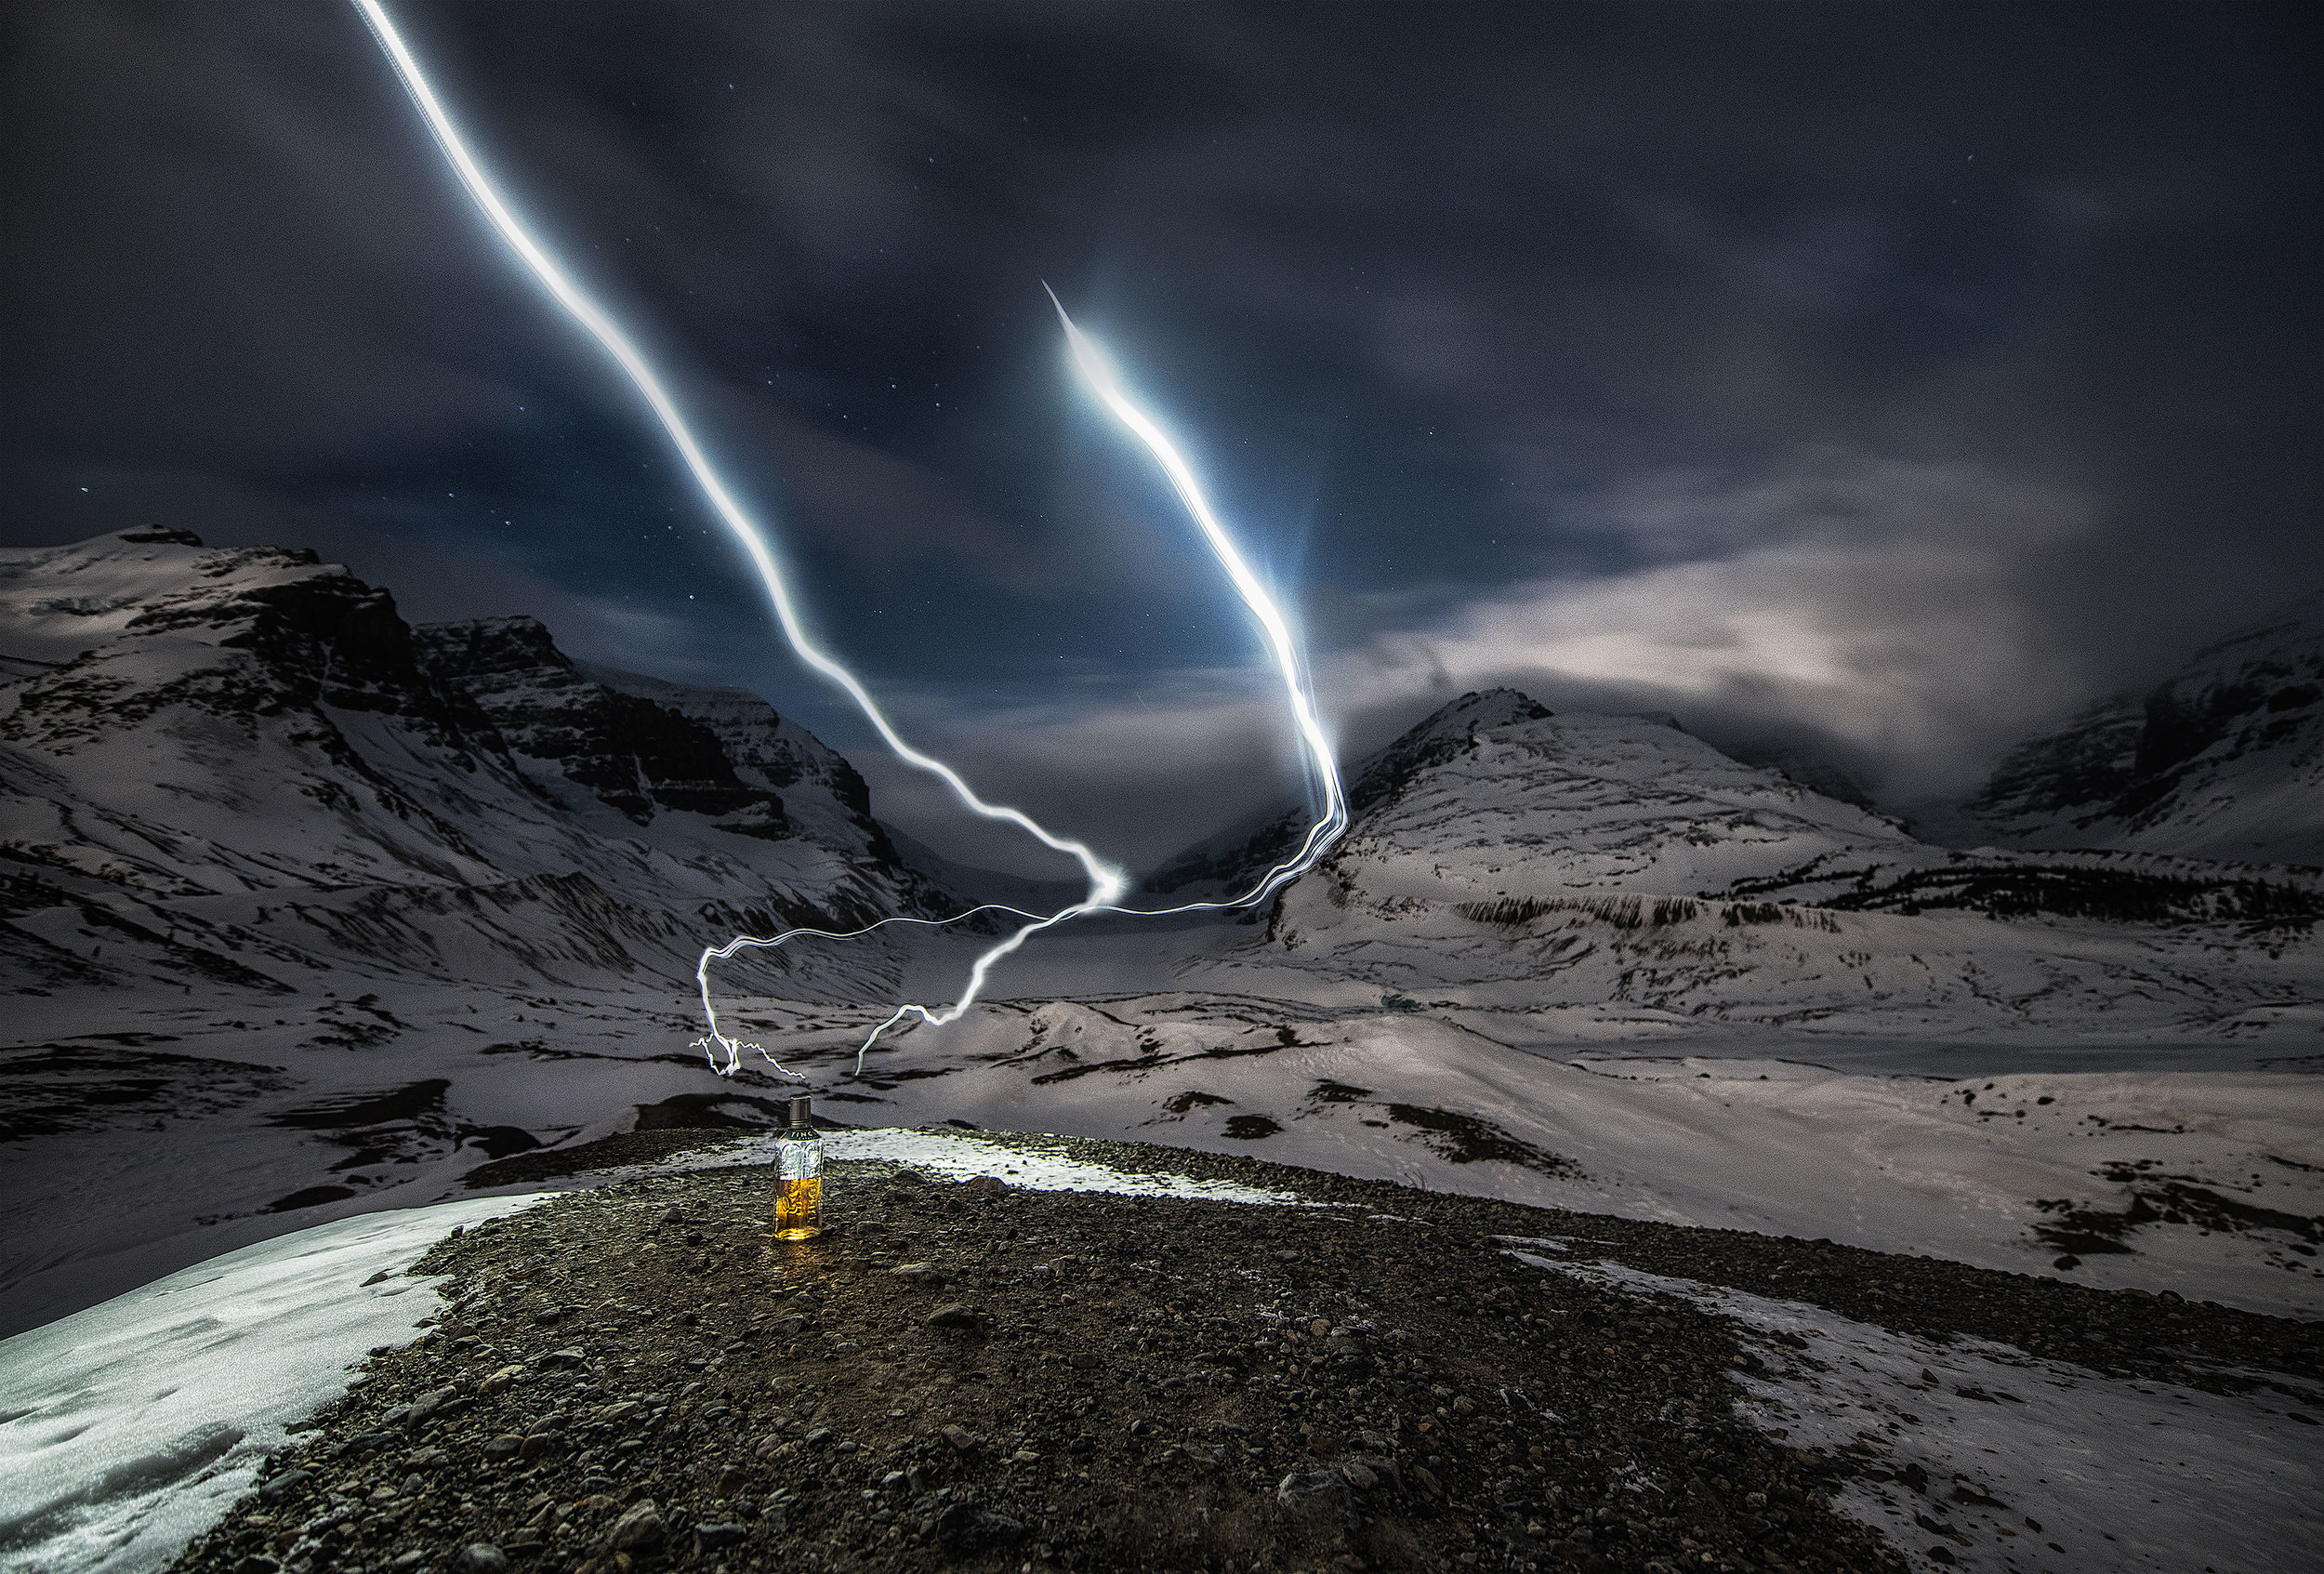 austin-trigg-whiskey-banff-alberta-product-TINCUP-Athabasca-Glacier-night-long-exposure.jpg